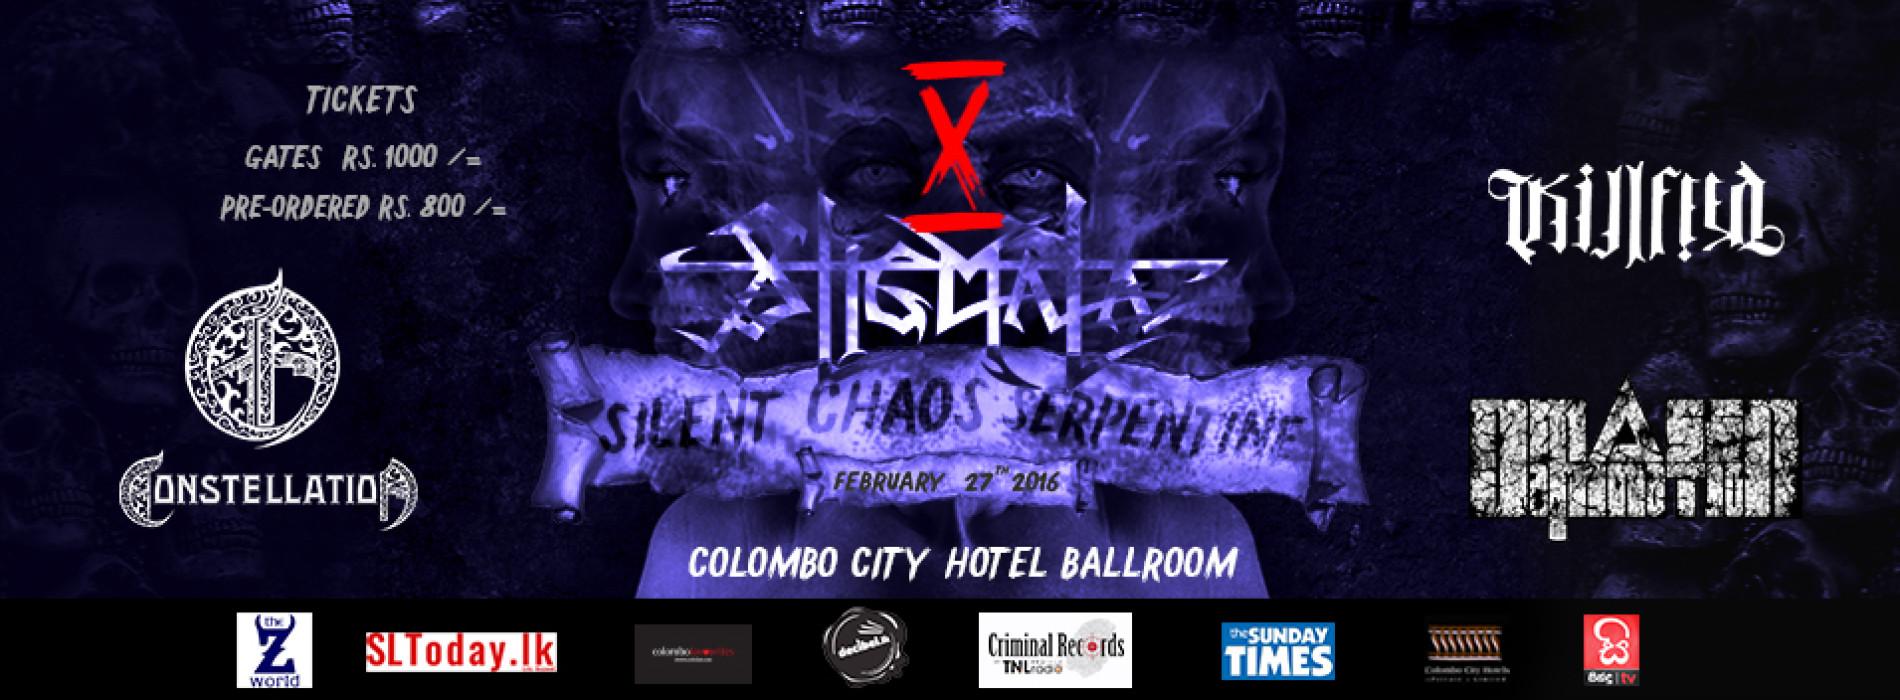 Stigmata Live : SILENT CHAOS SERPENTINE 10 Year Anniversary Concert